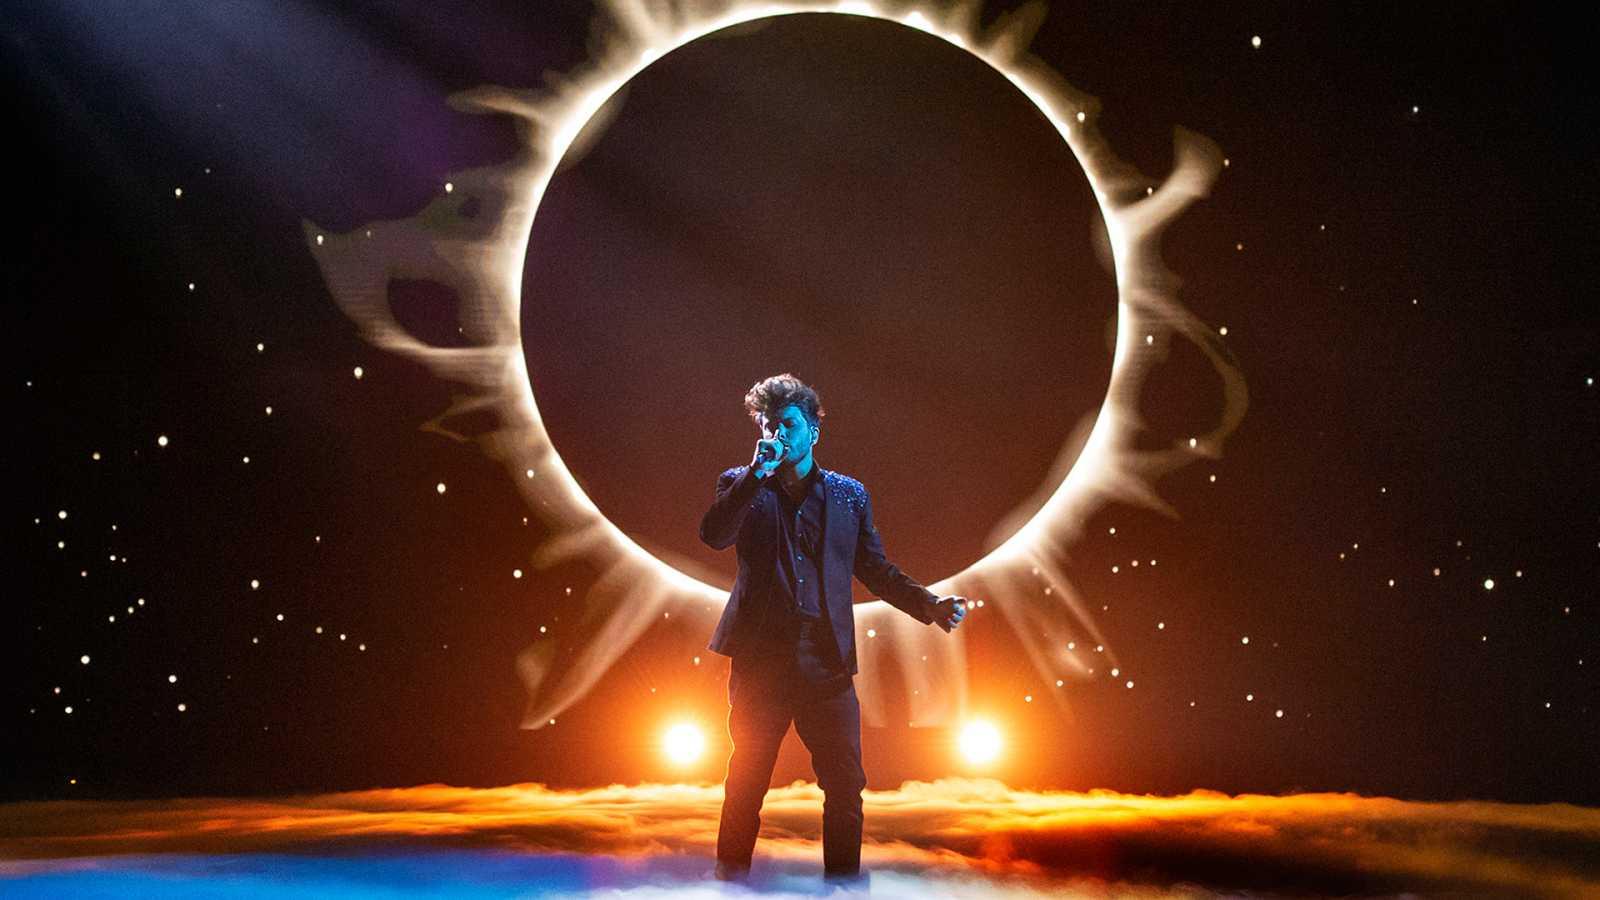 Tarde lo que tarde - Blas Cantó pone rumbo a Eurovisión - 06/05/21 - escuchar ahora